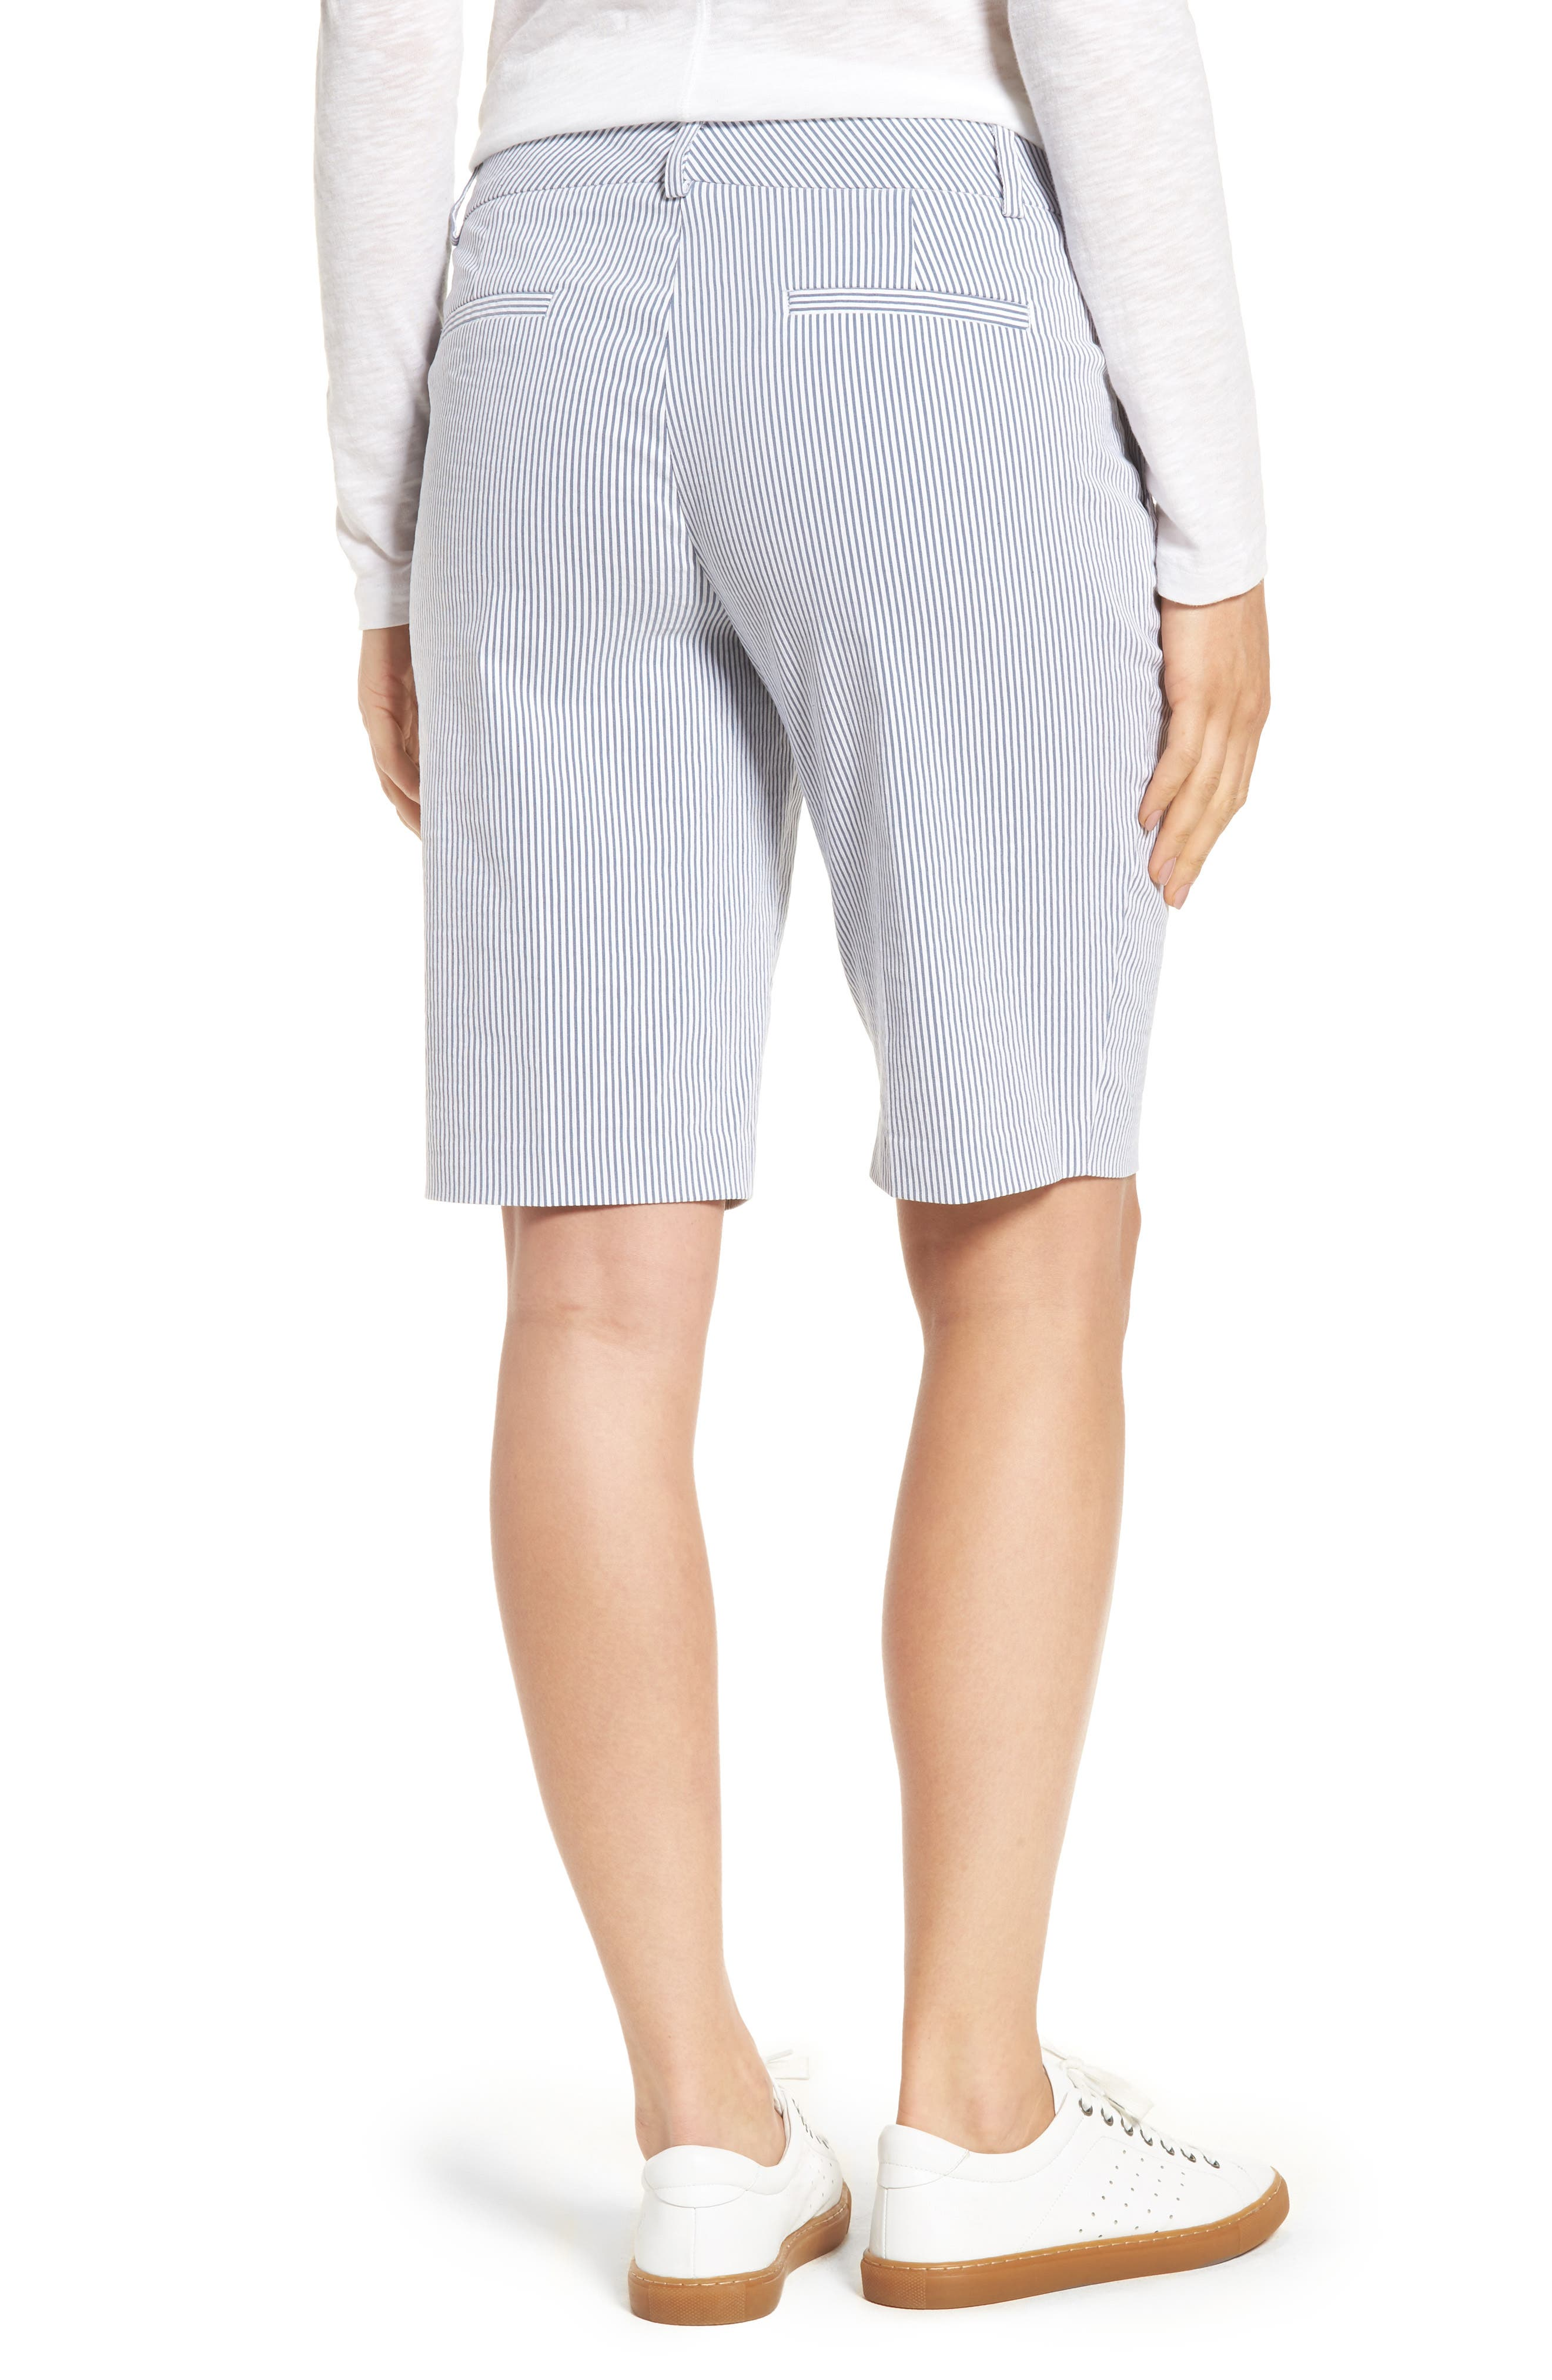 Stretch Bermuda Shorts,                             Alternate thumbnail 2, color,                             Blue- White Seersucker